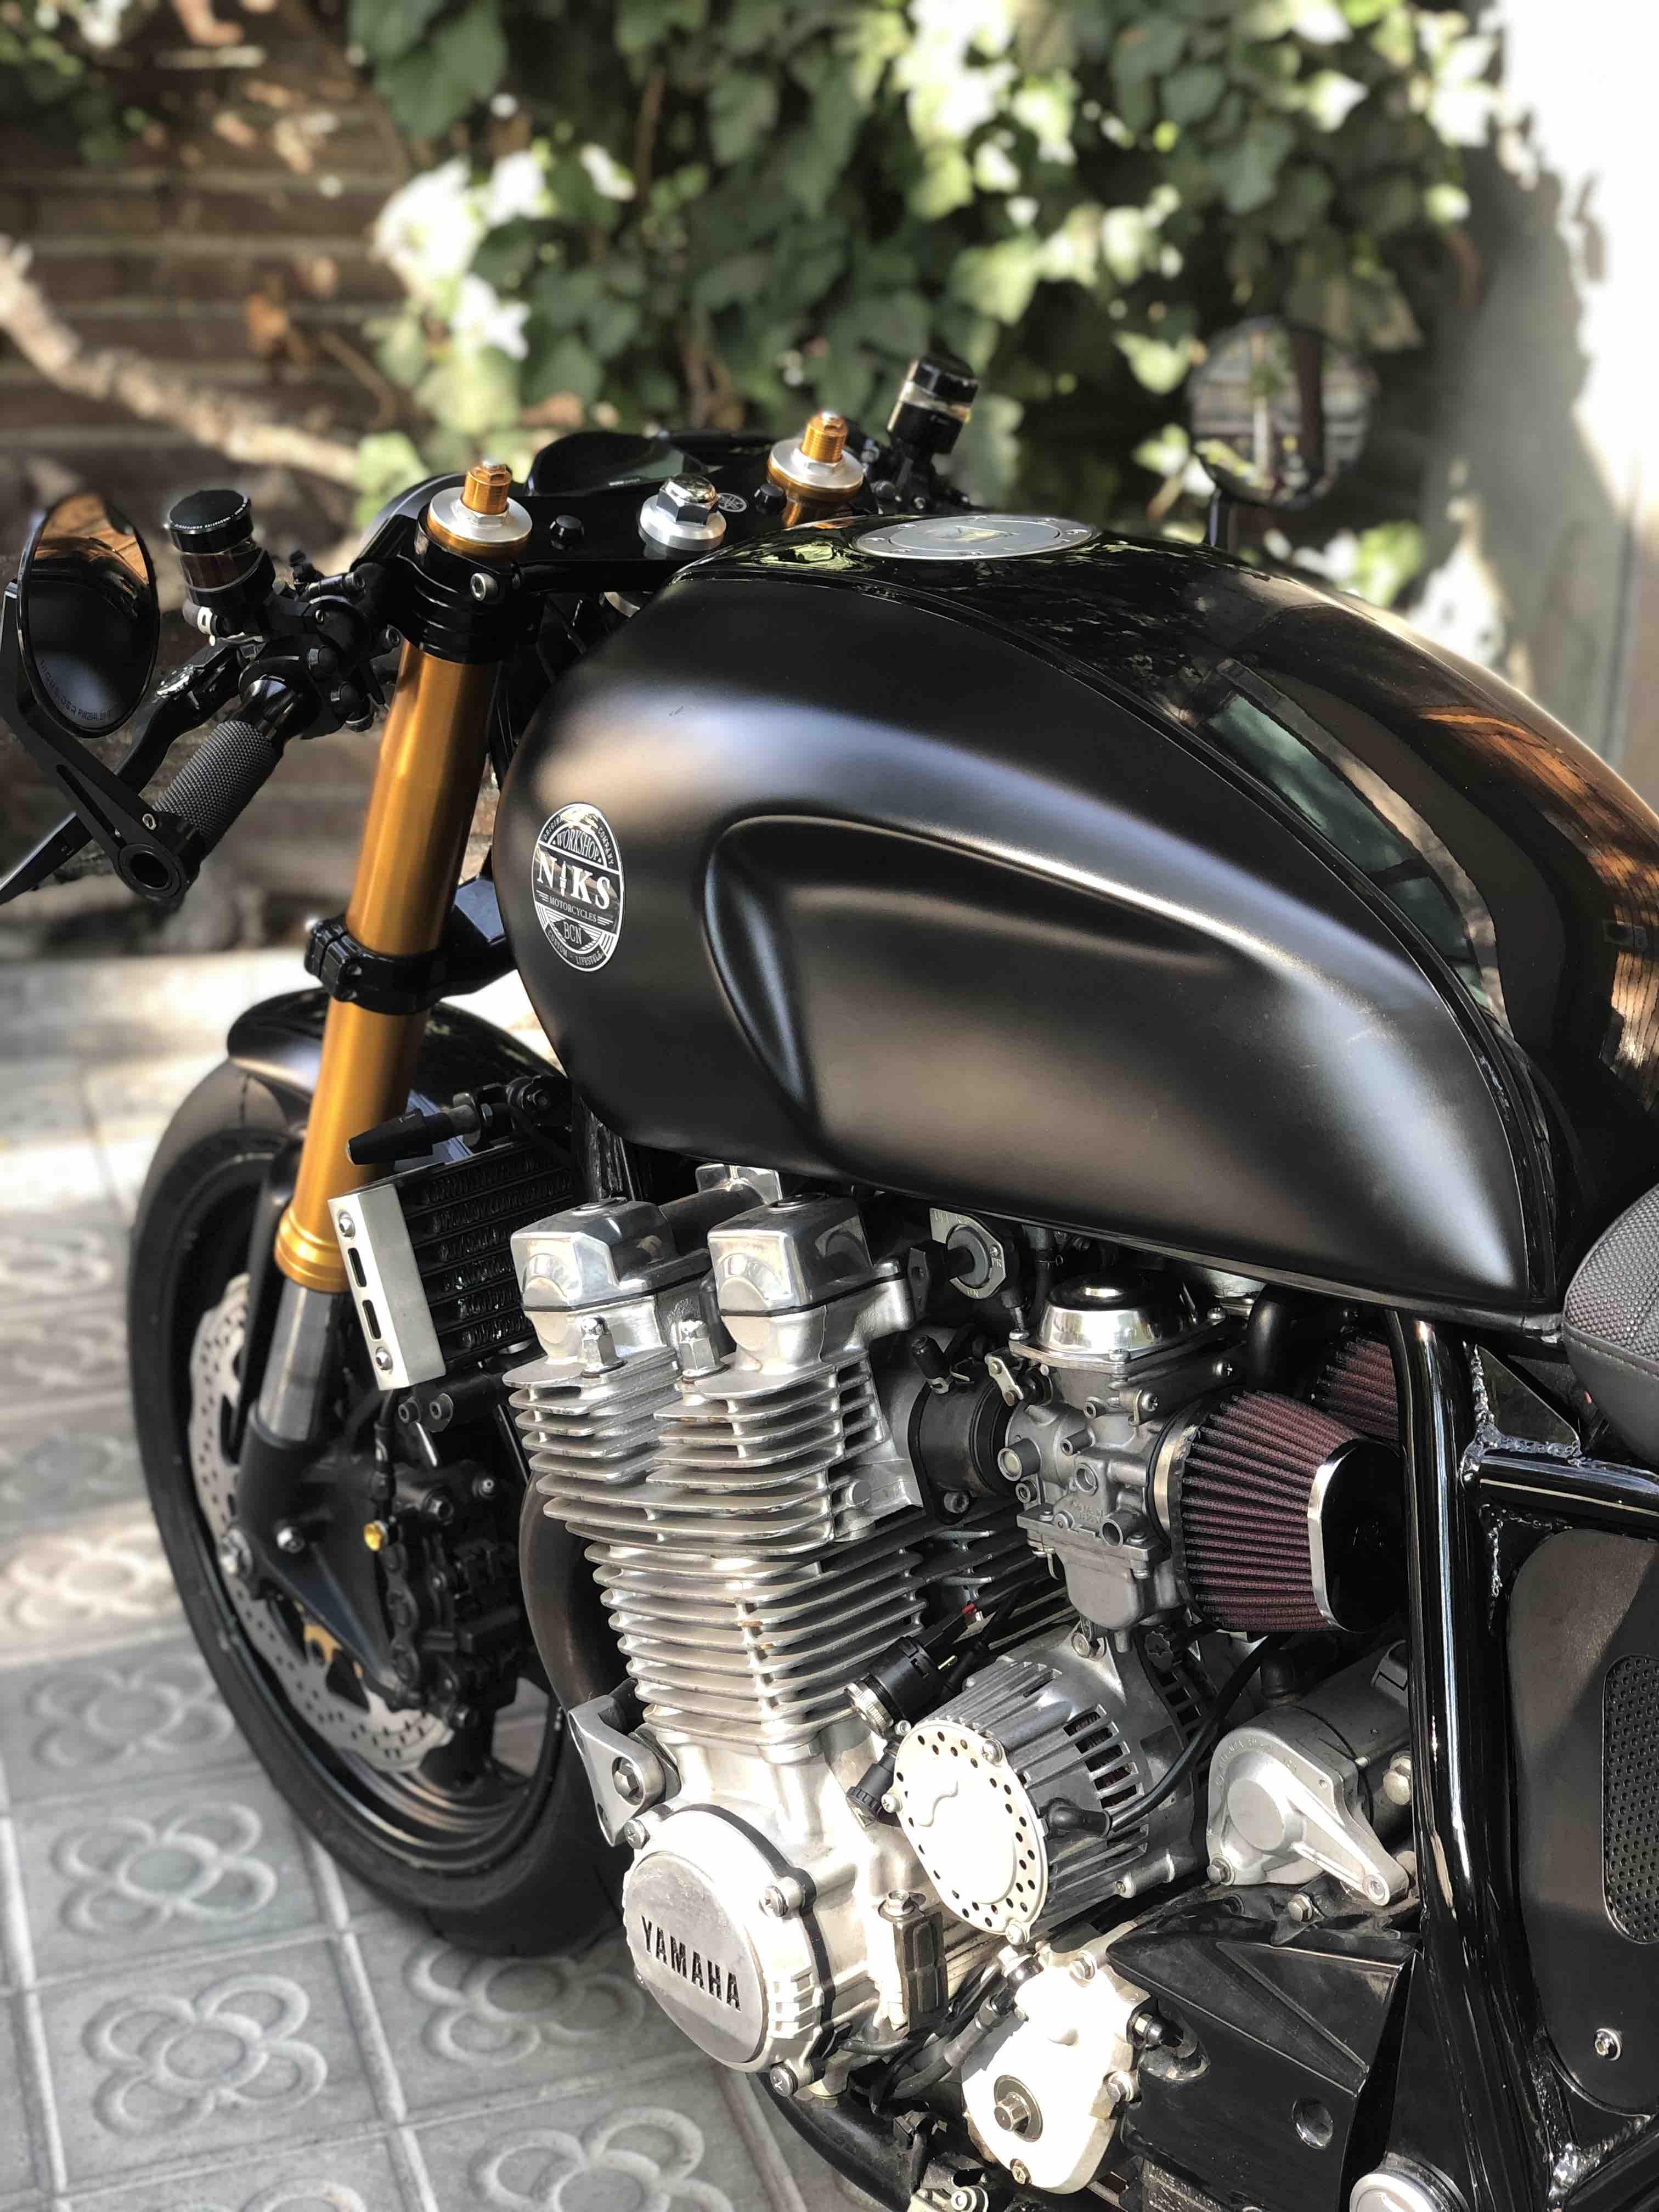 Yamaha Xjr 1300 Niks Motorcycles